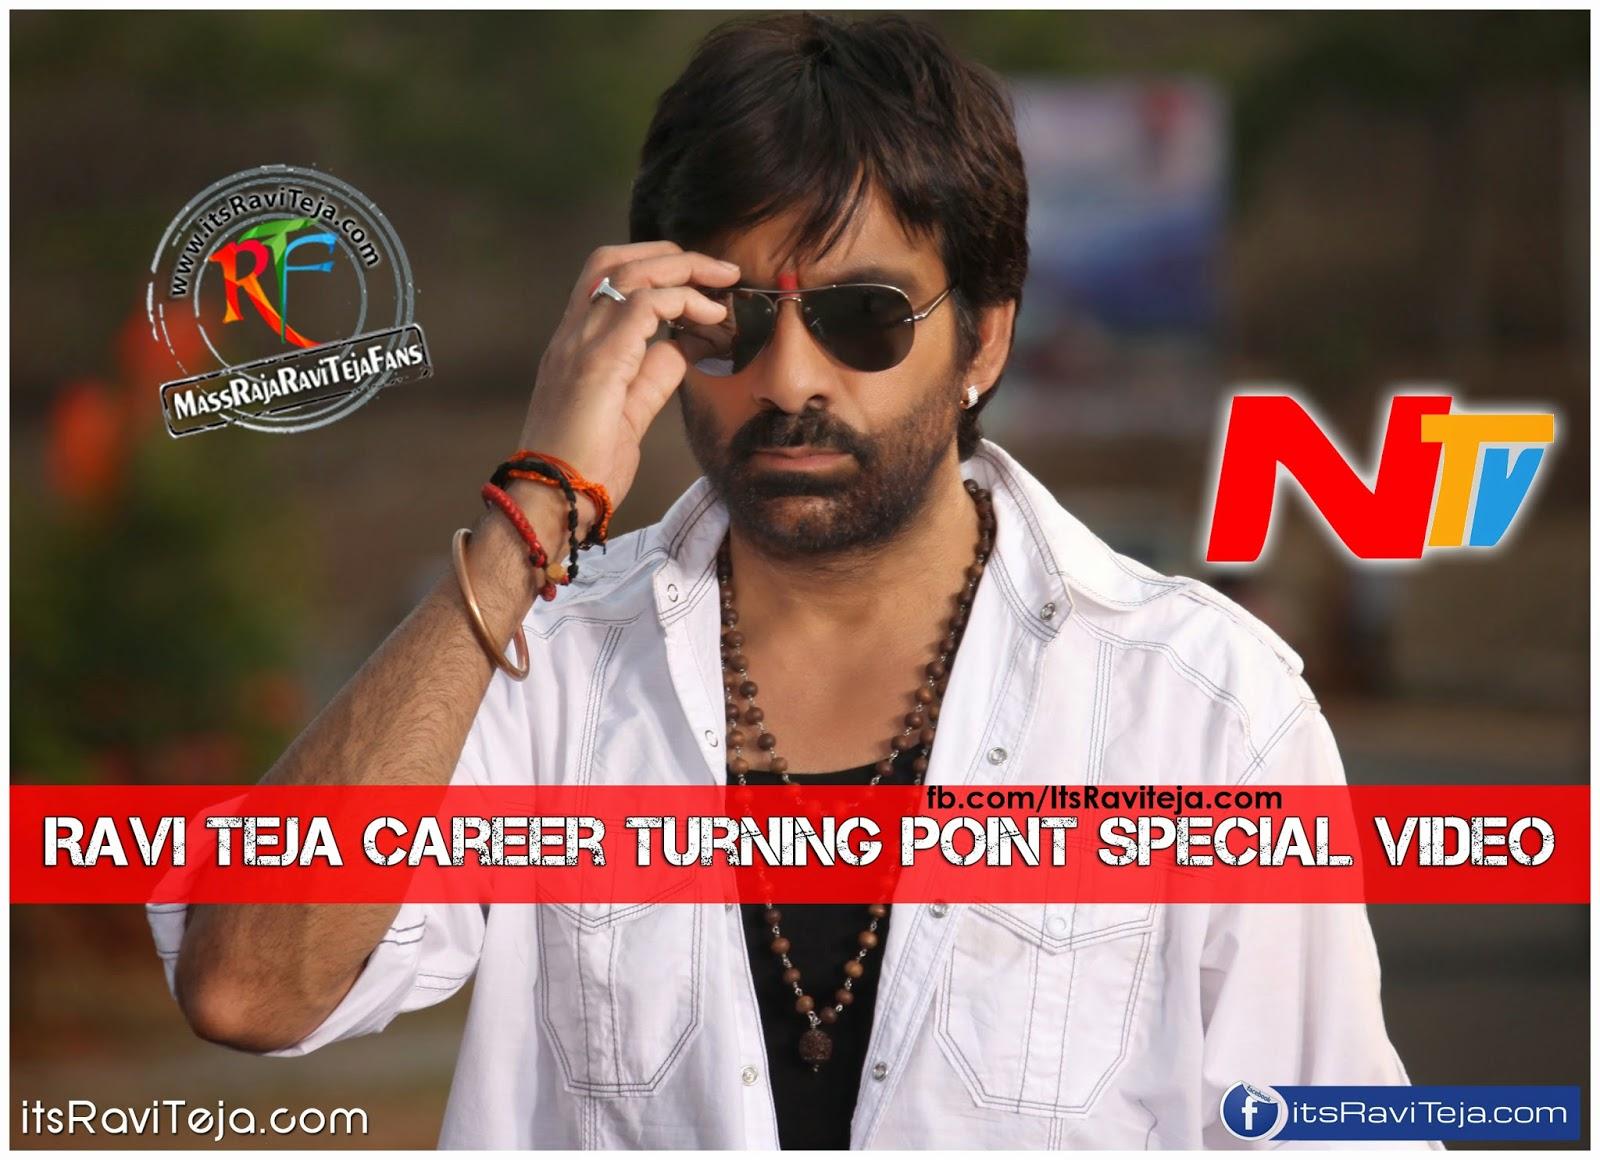 Ravi Teja Career Turning Point